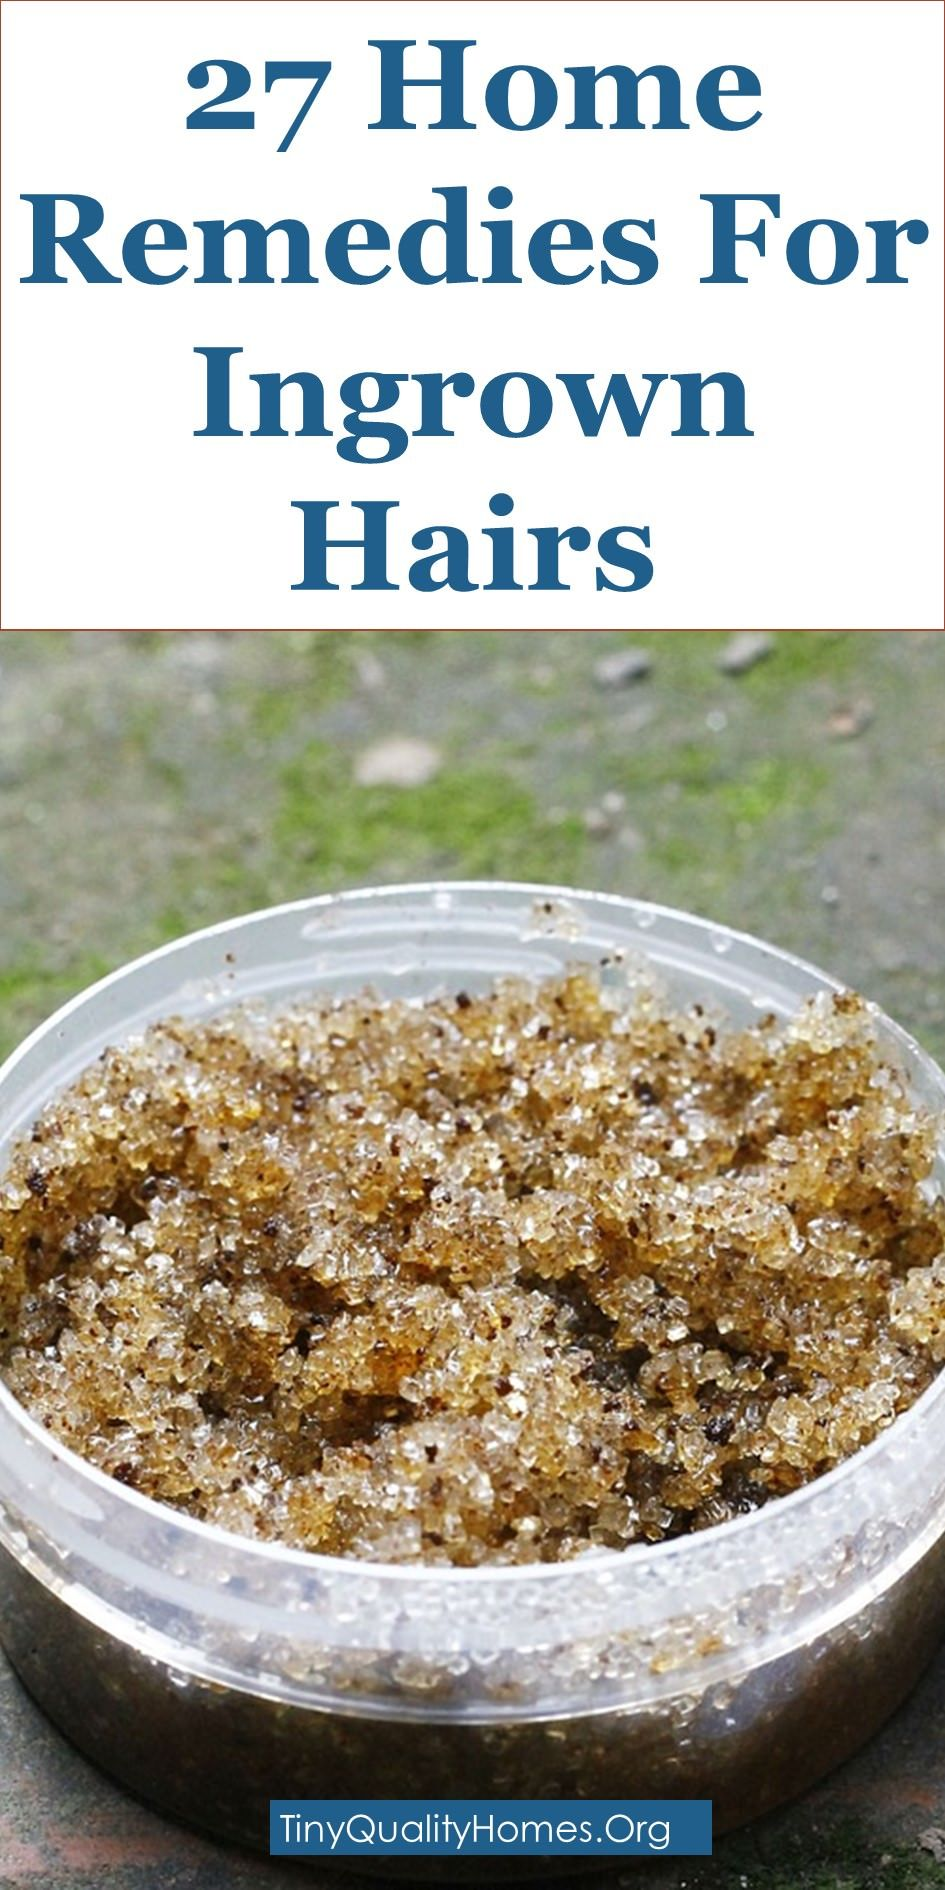 Effective Home Remedies For Ingrown Hairs  Ingrown hair remedy